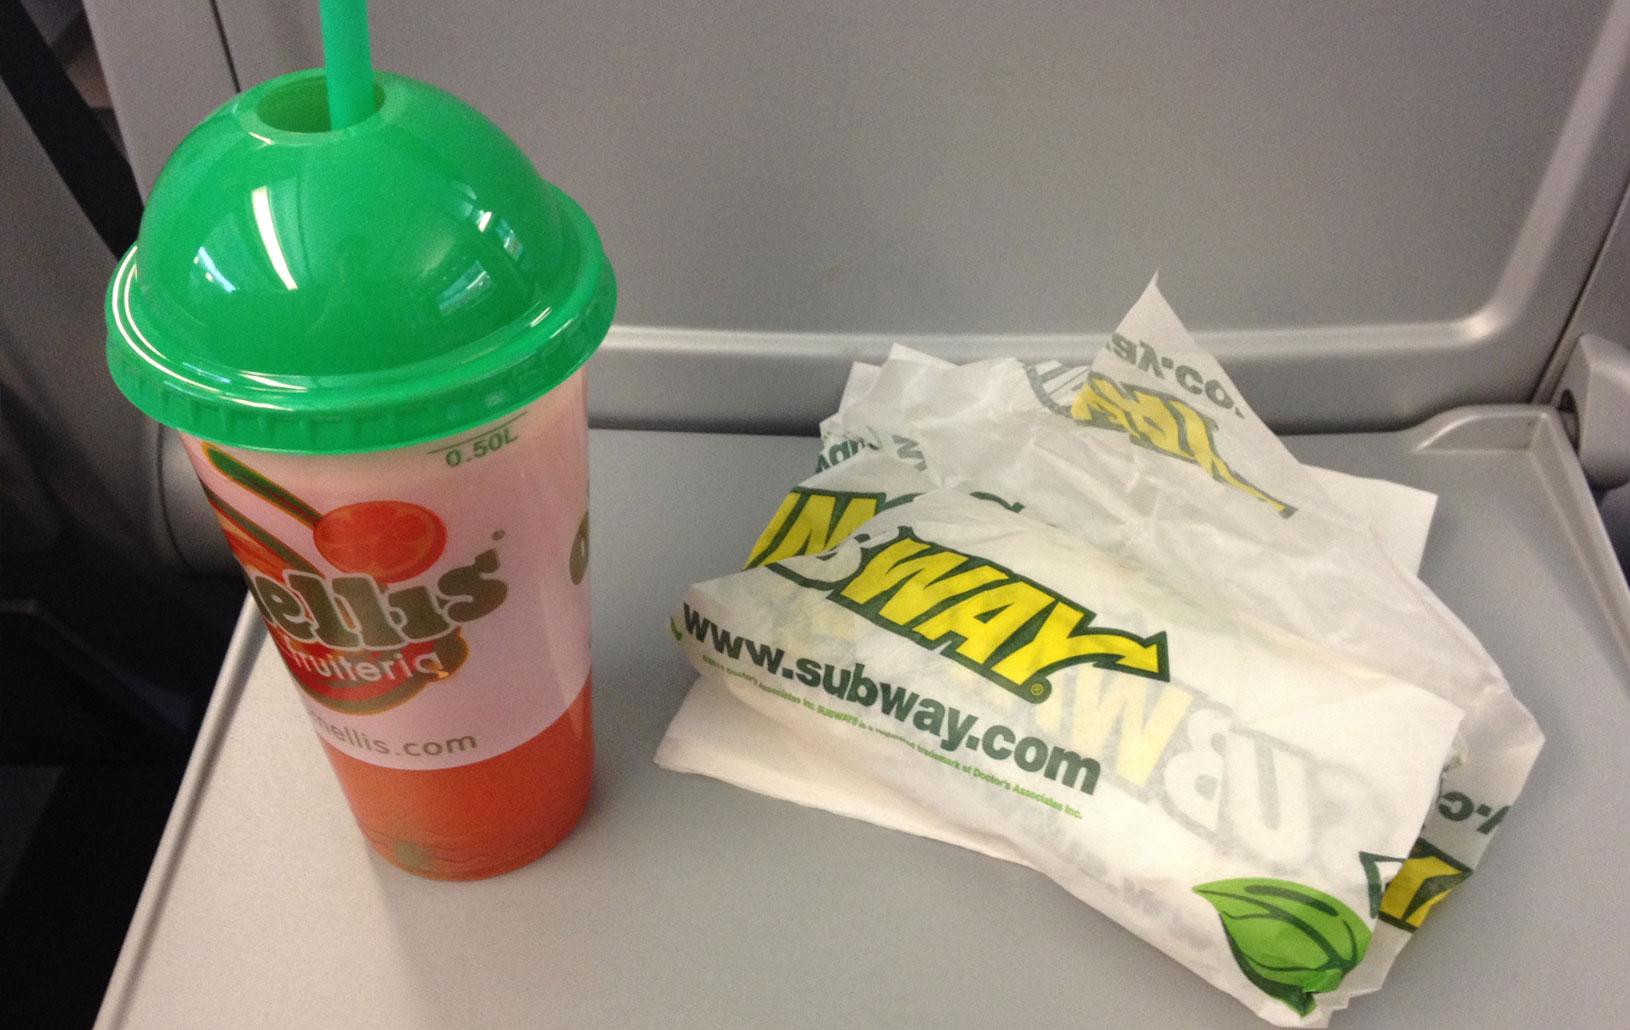 gesunder-snack-unterwegs